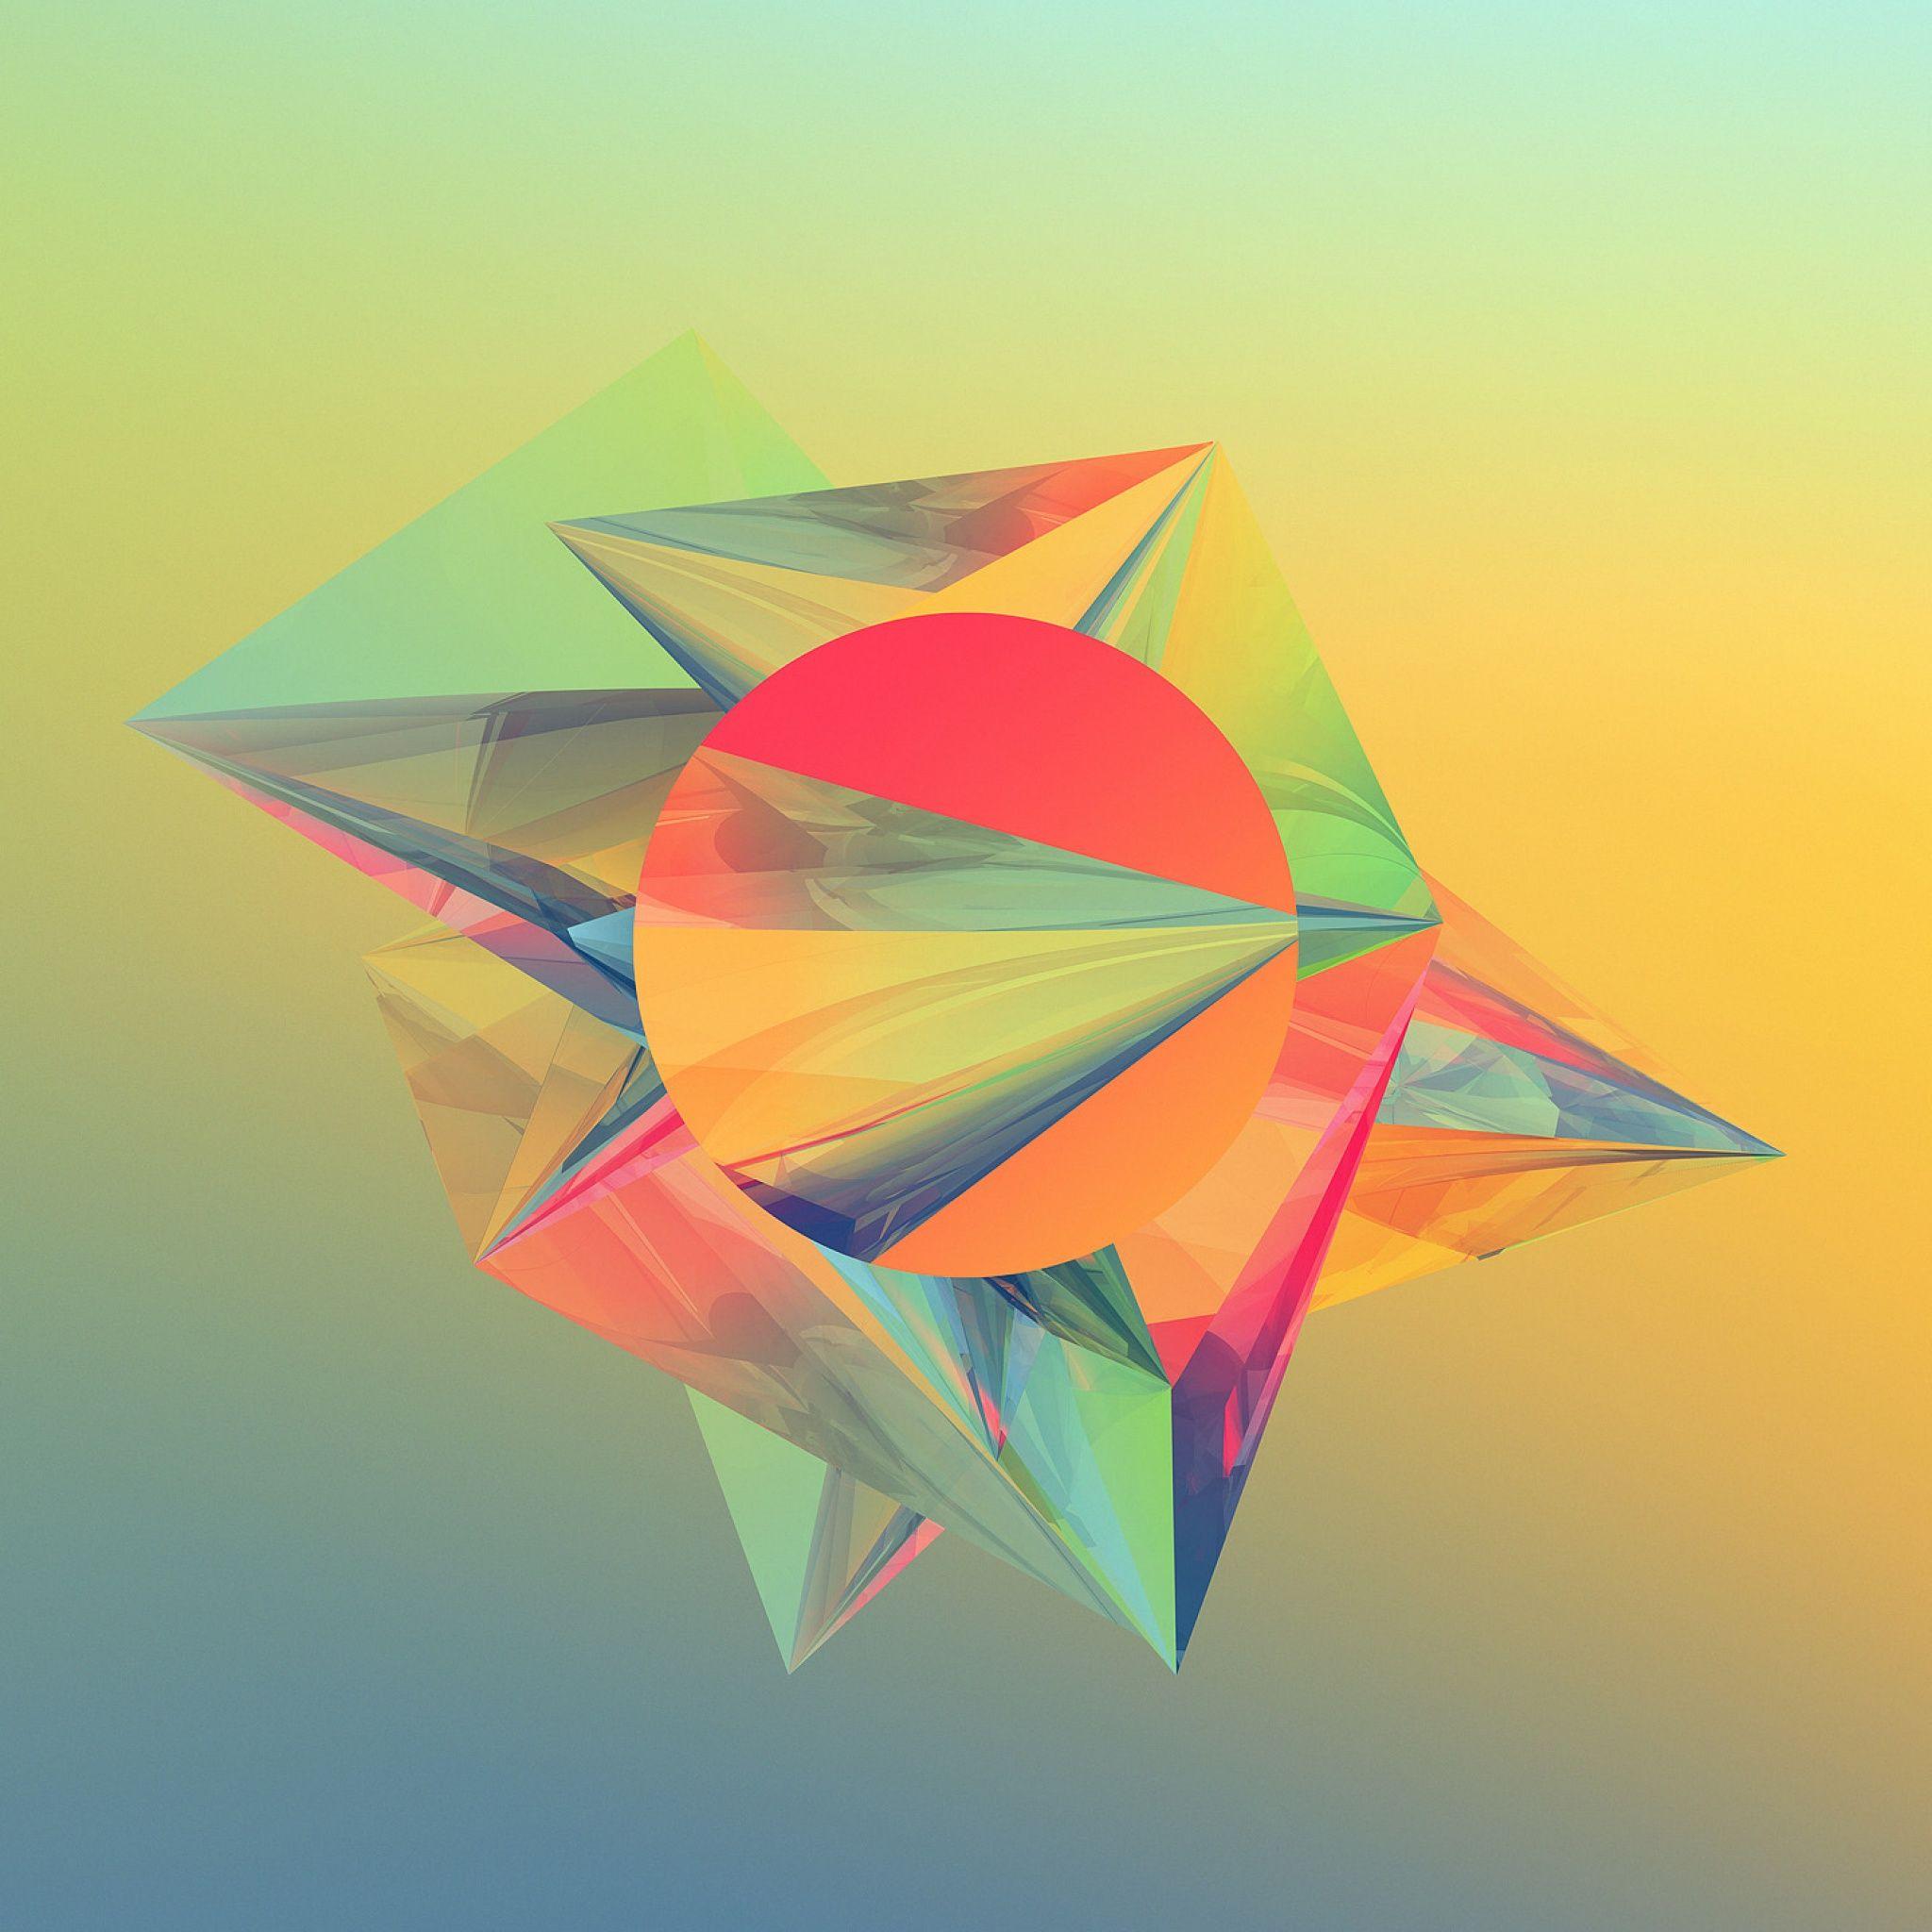 Geometric Abstract Shapes IPad Air Wallpaper